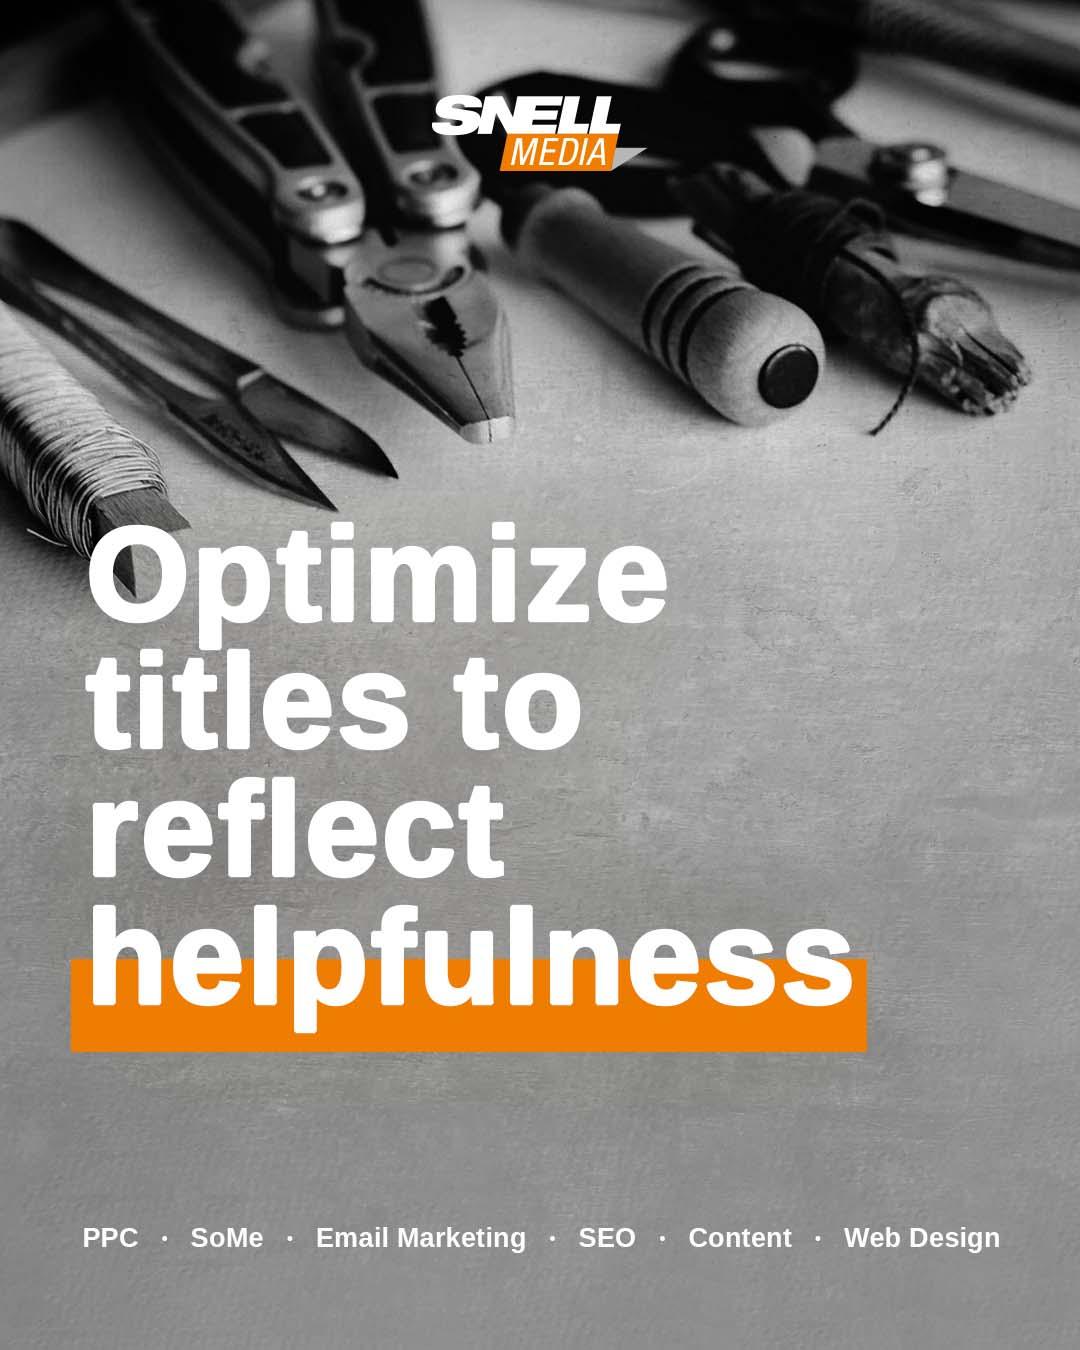 Optimize titles to reflect helpfulness